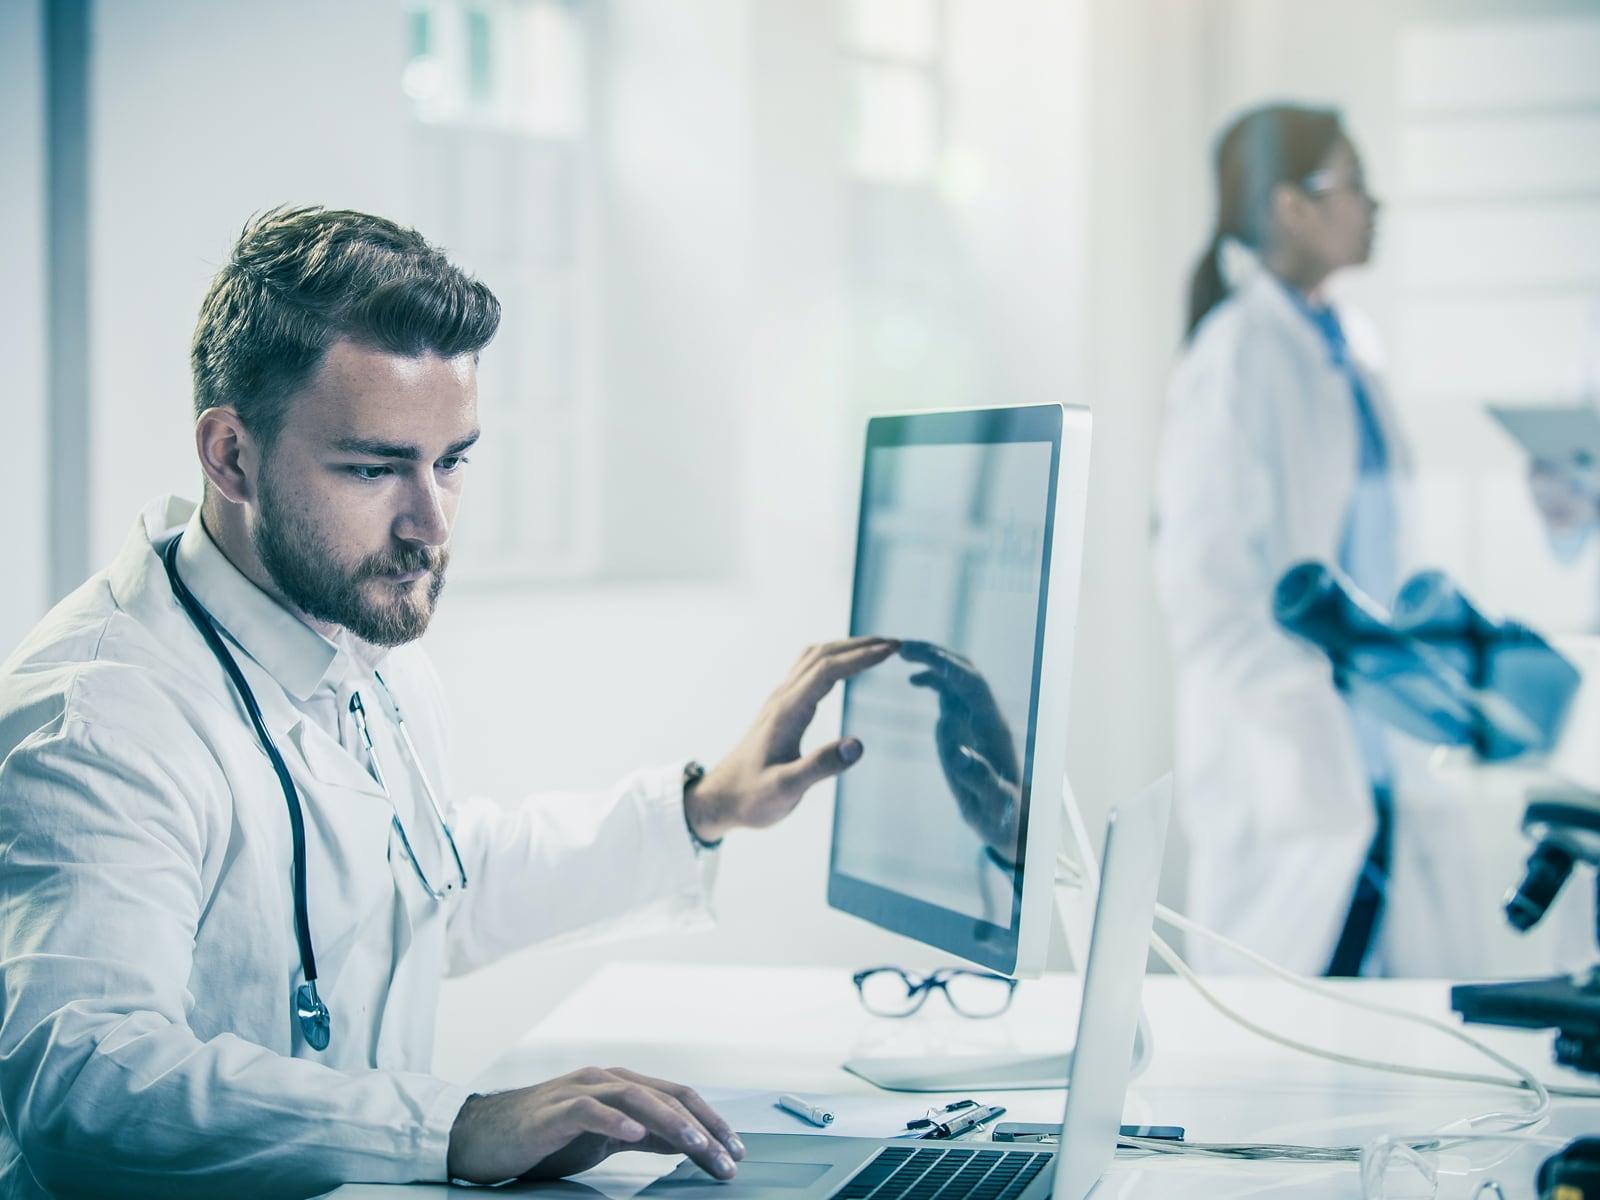 Doctor looking at desktop screen